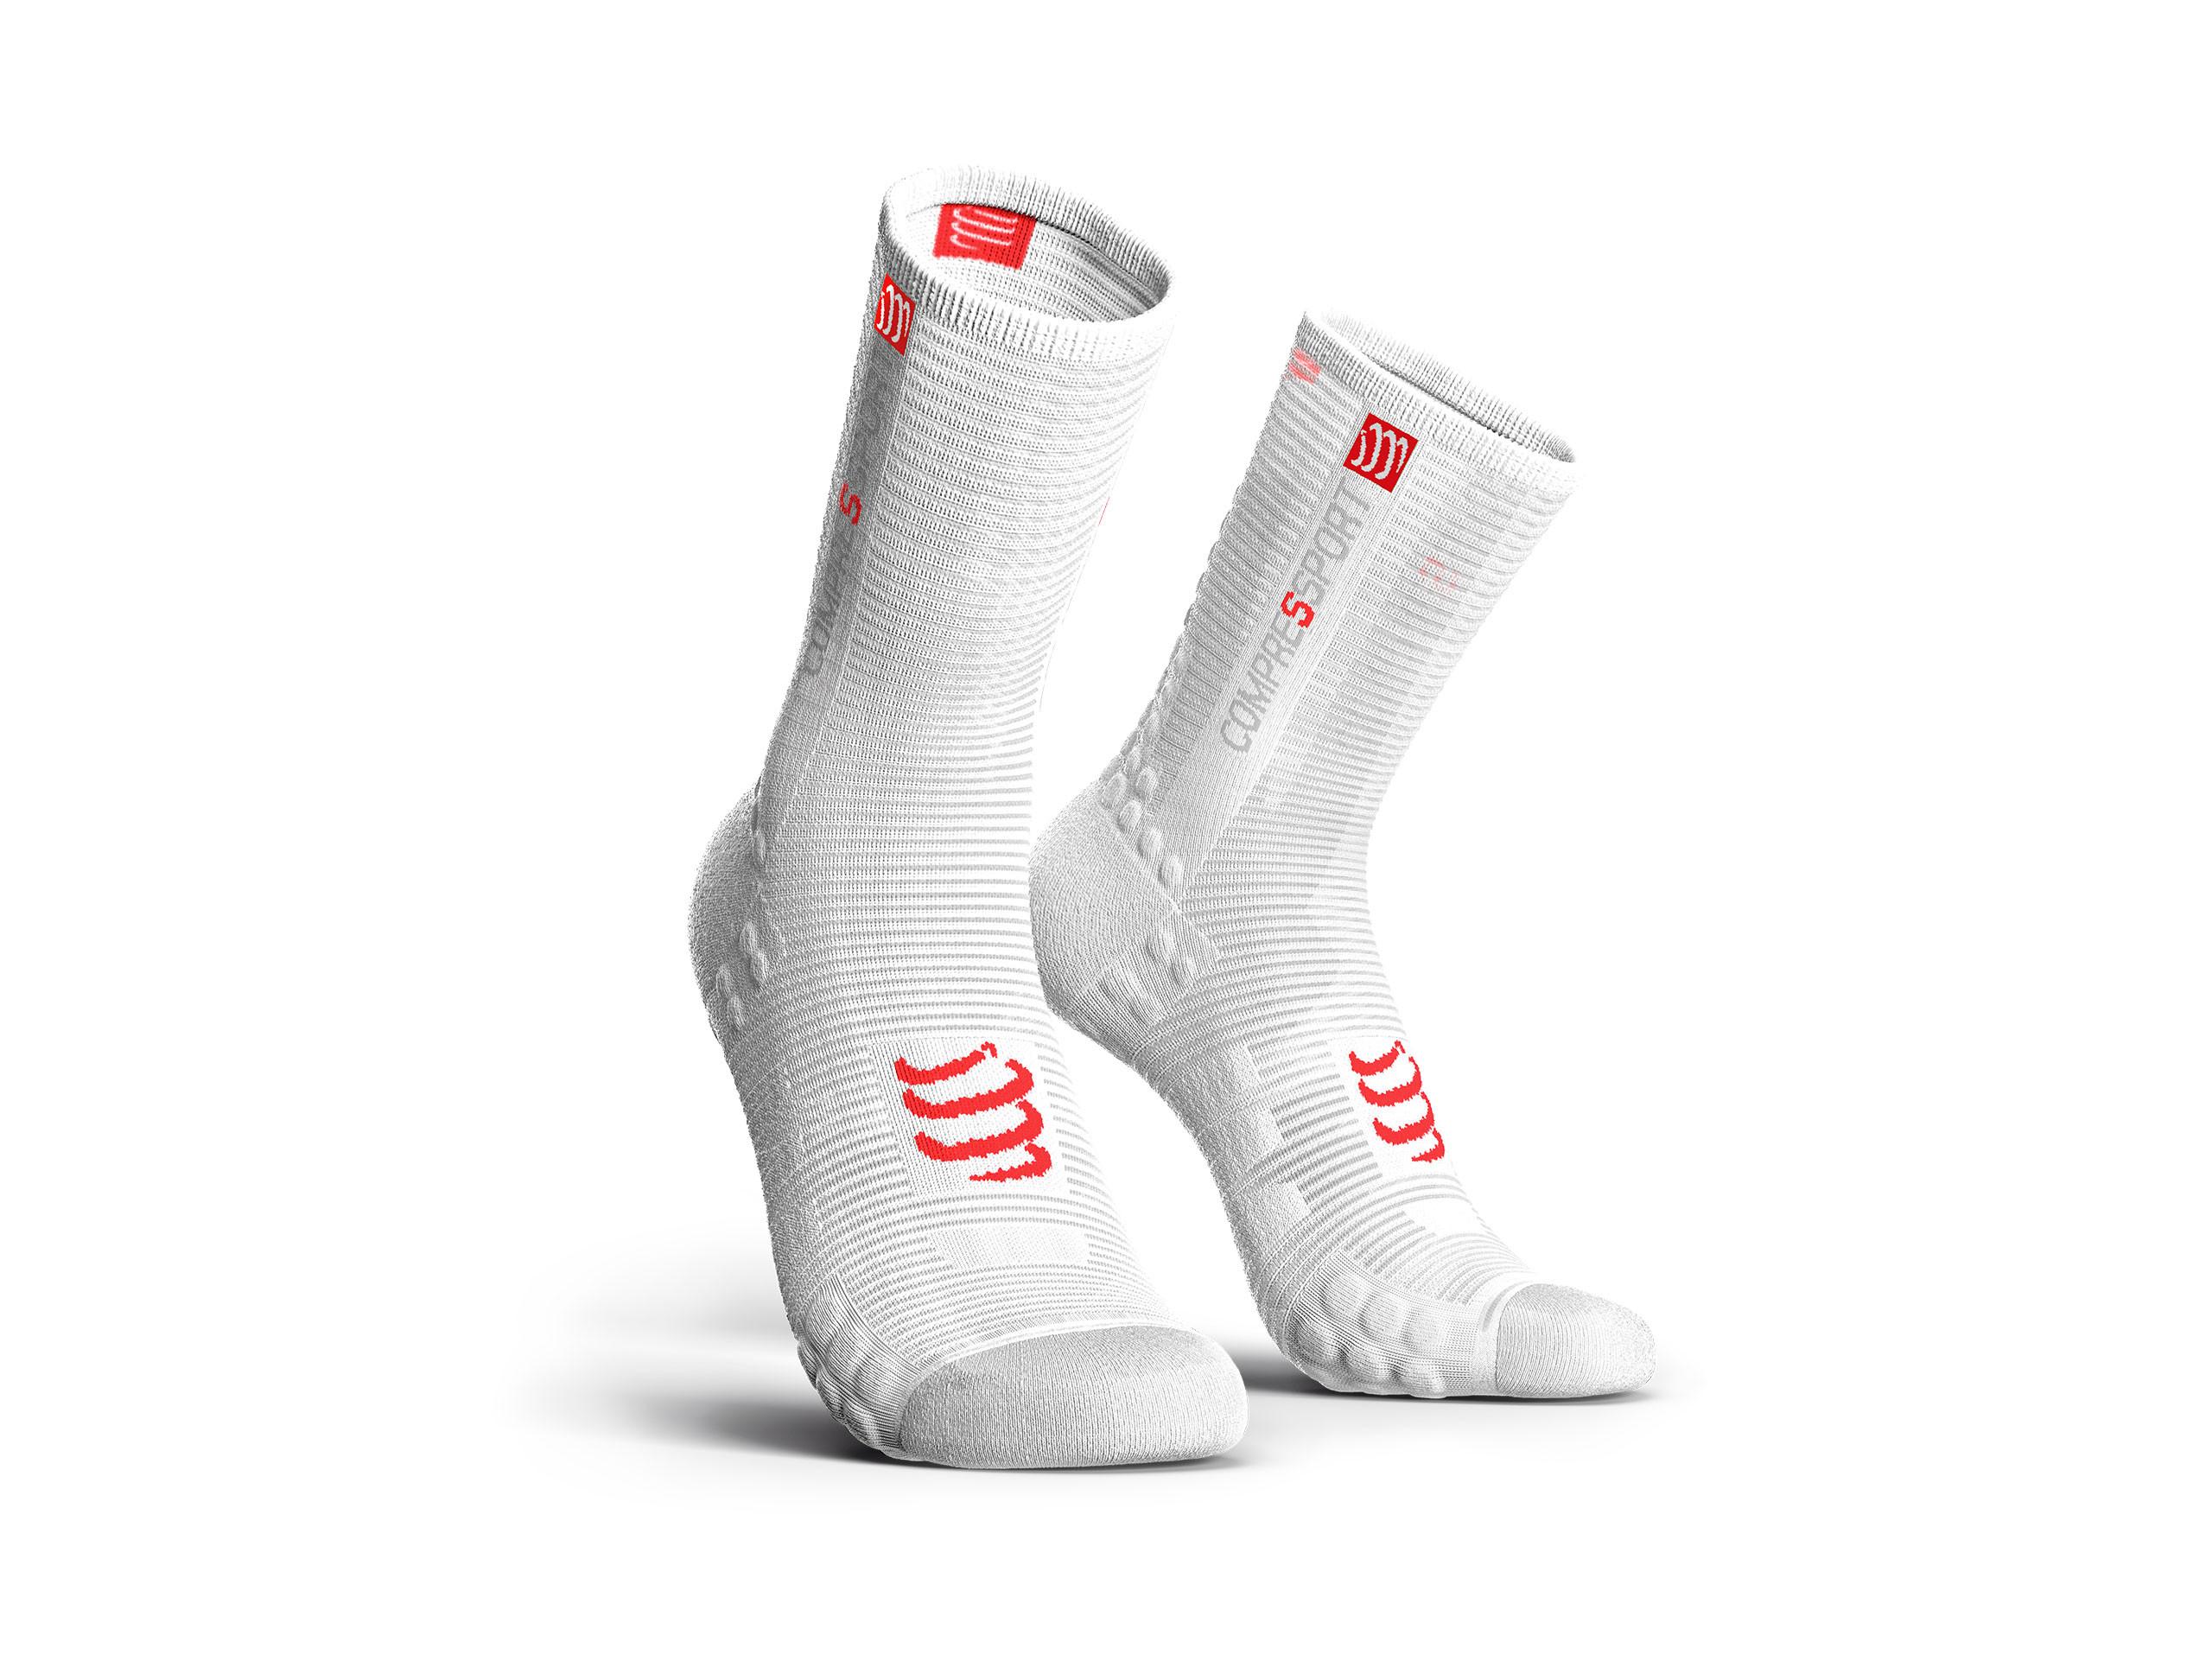 Calcetines deportivos pro v3.0 Bike blancos